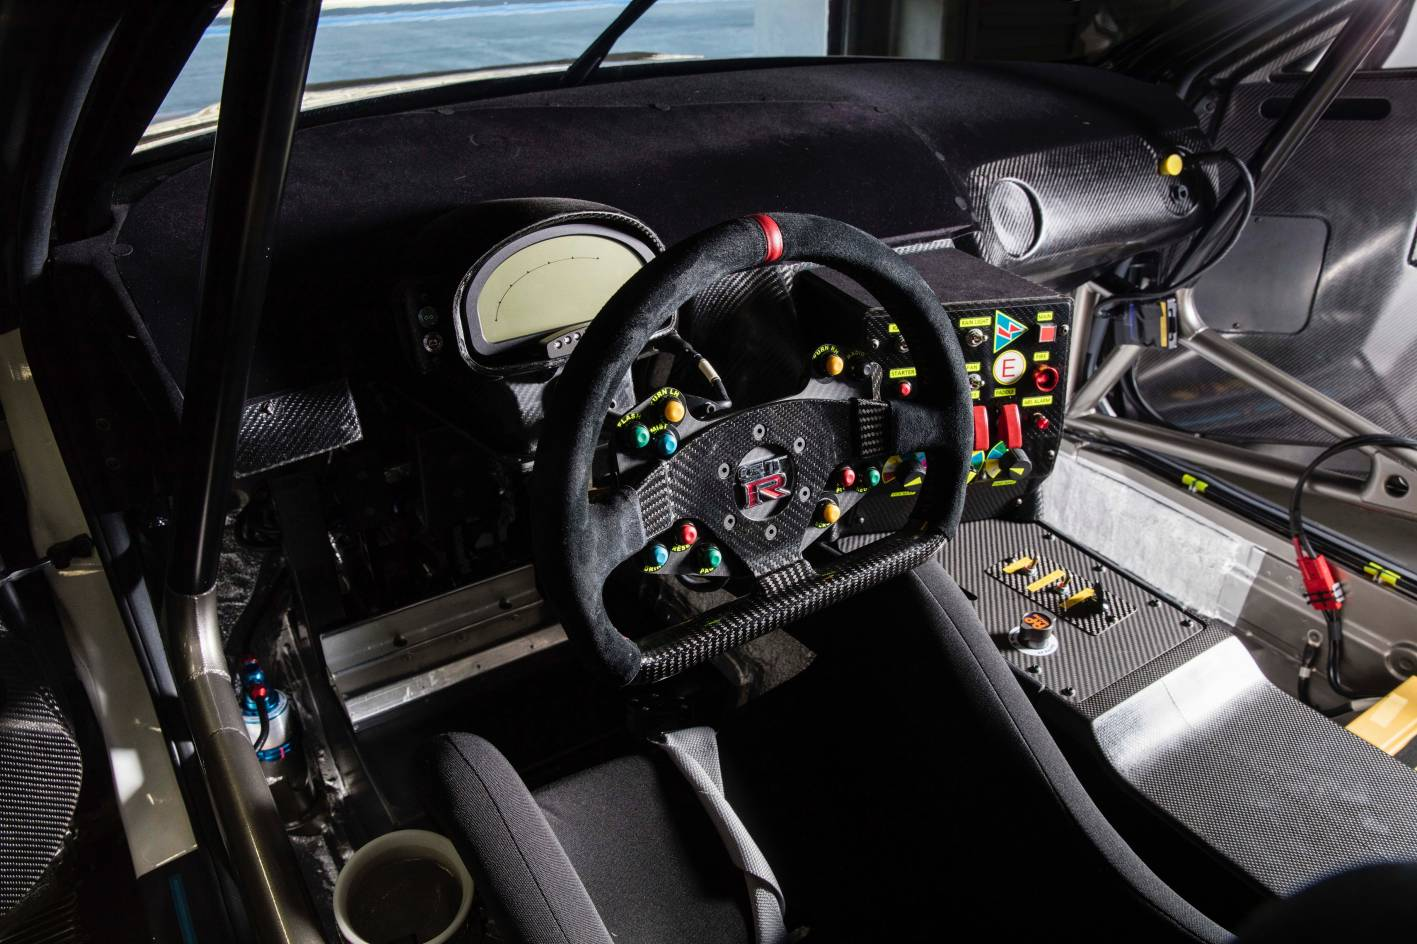 2016-nissan-gt-r-nismo-gt3-bathurst-12-hour-cockpit ...